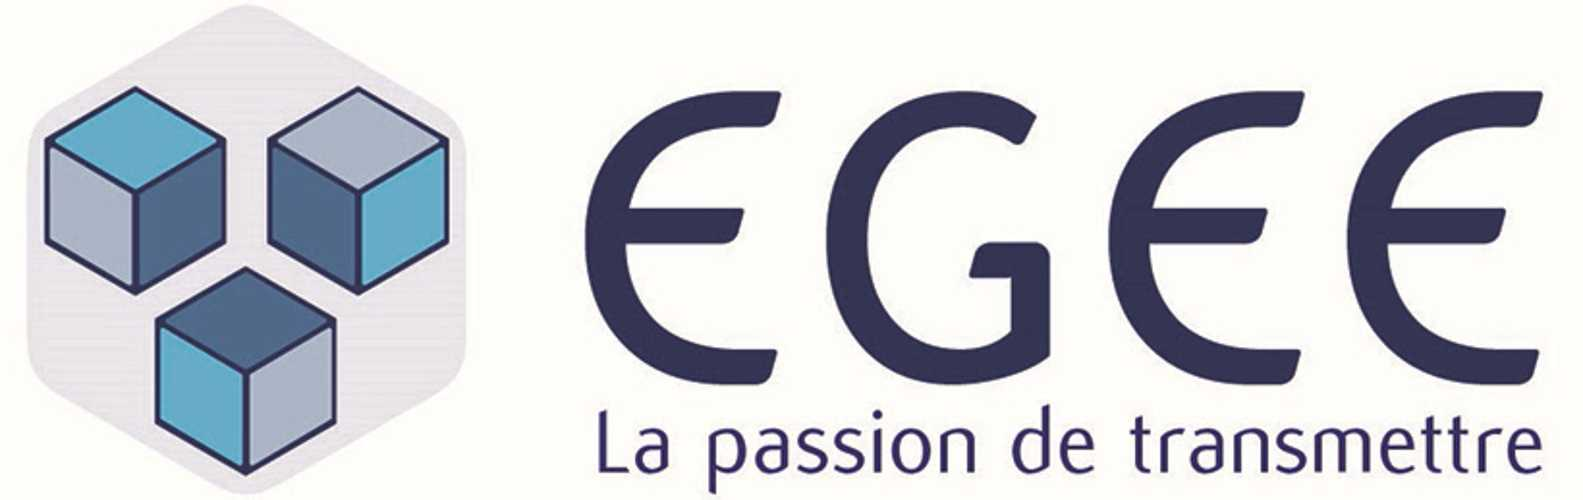 EGEE 0